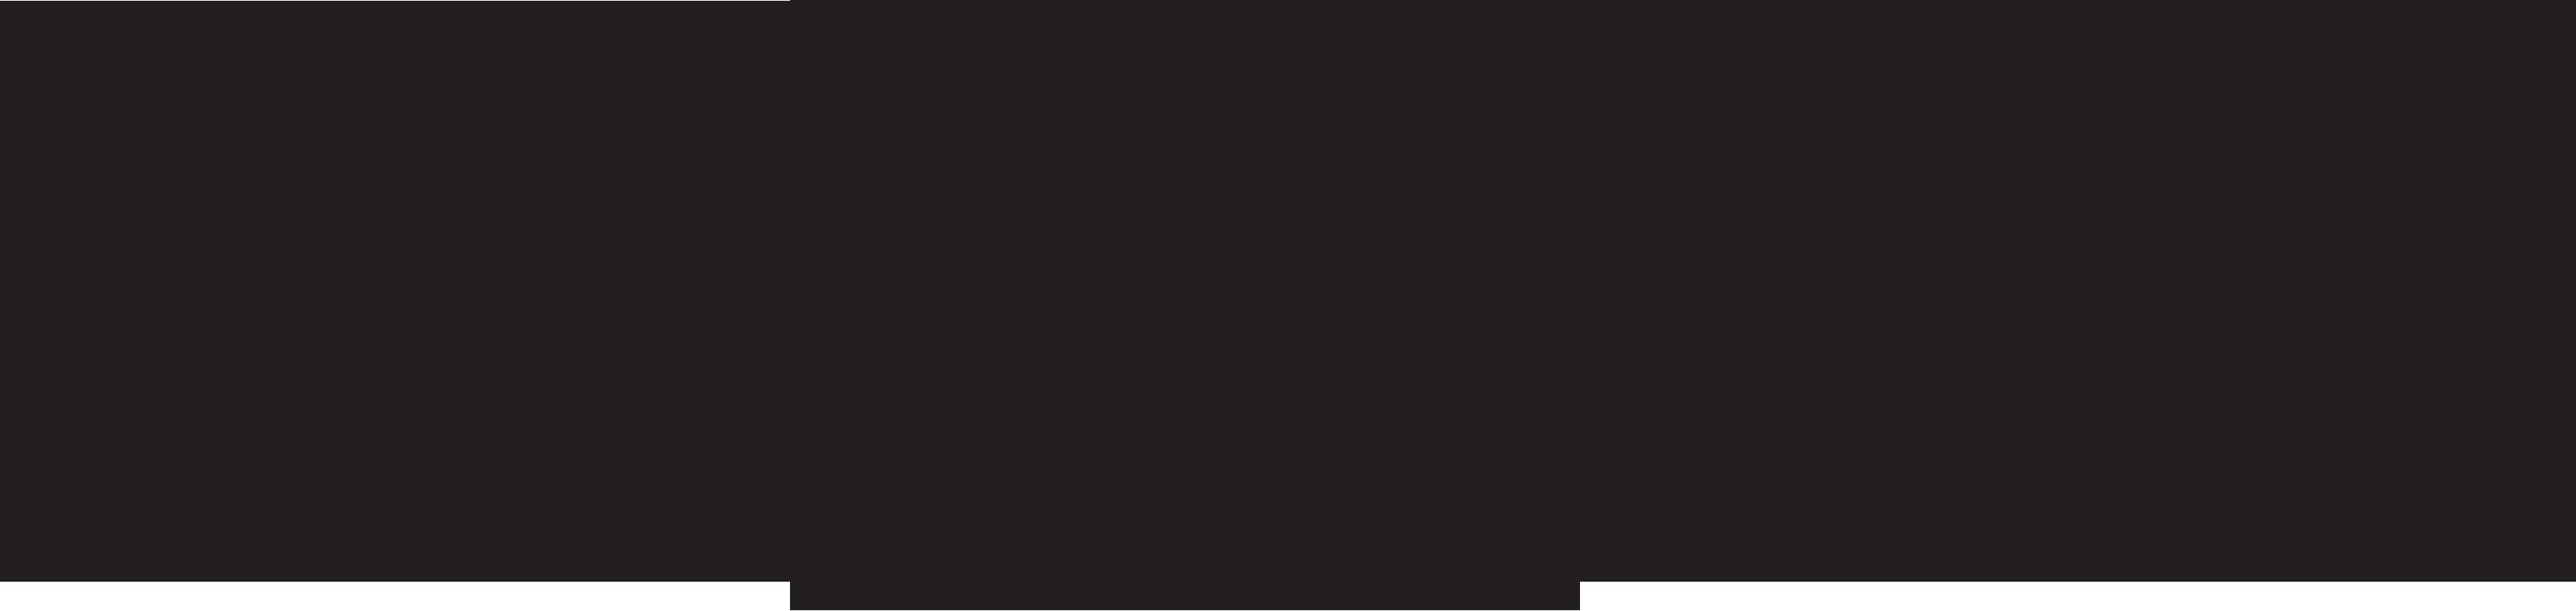 logo-k-array-gobos-do-brasil